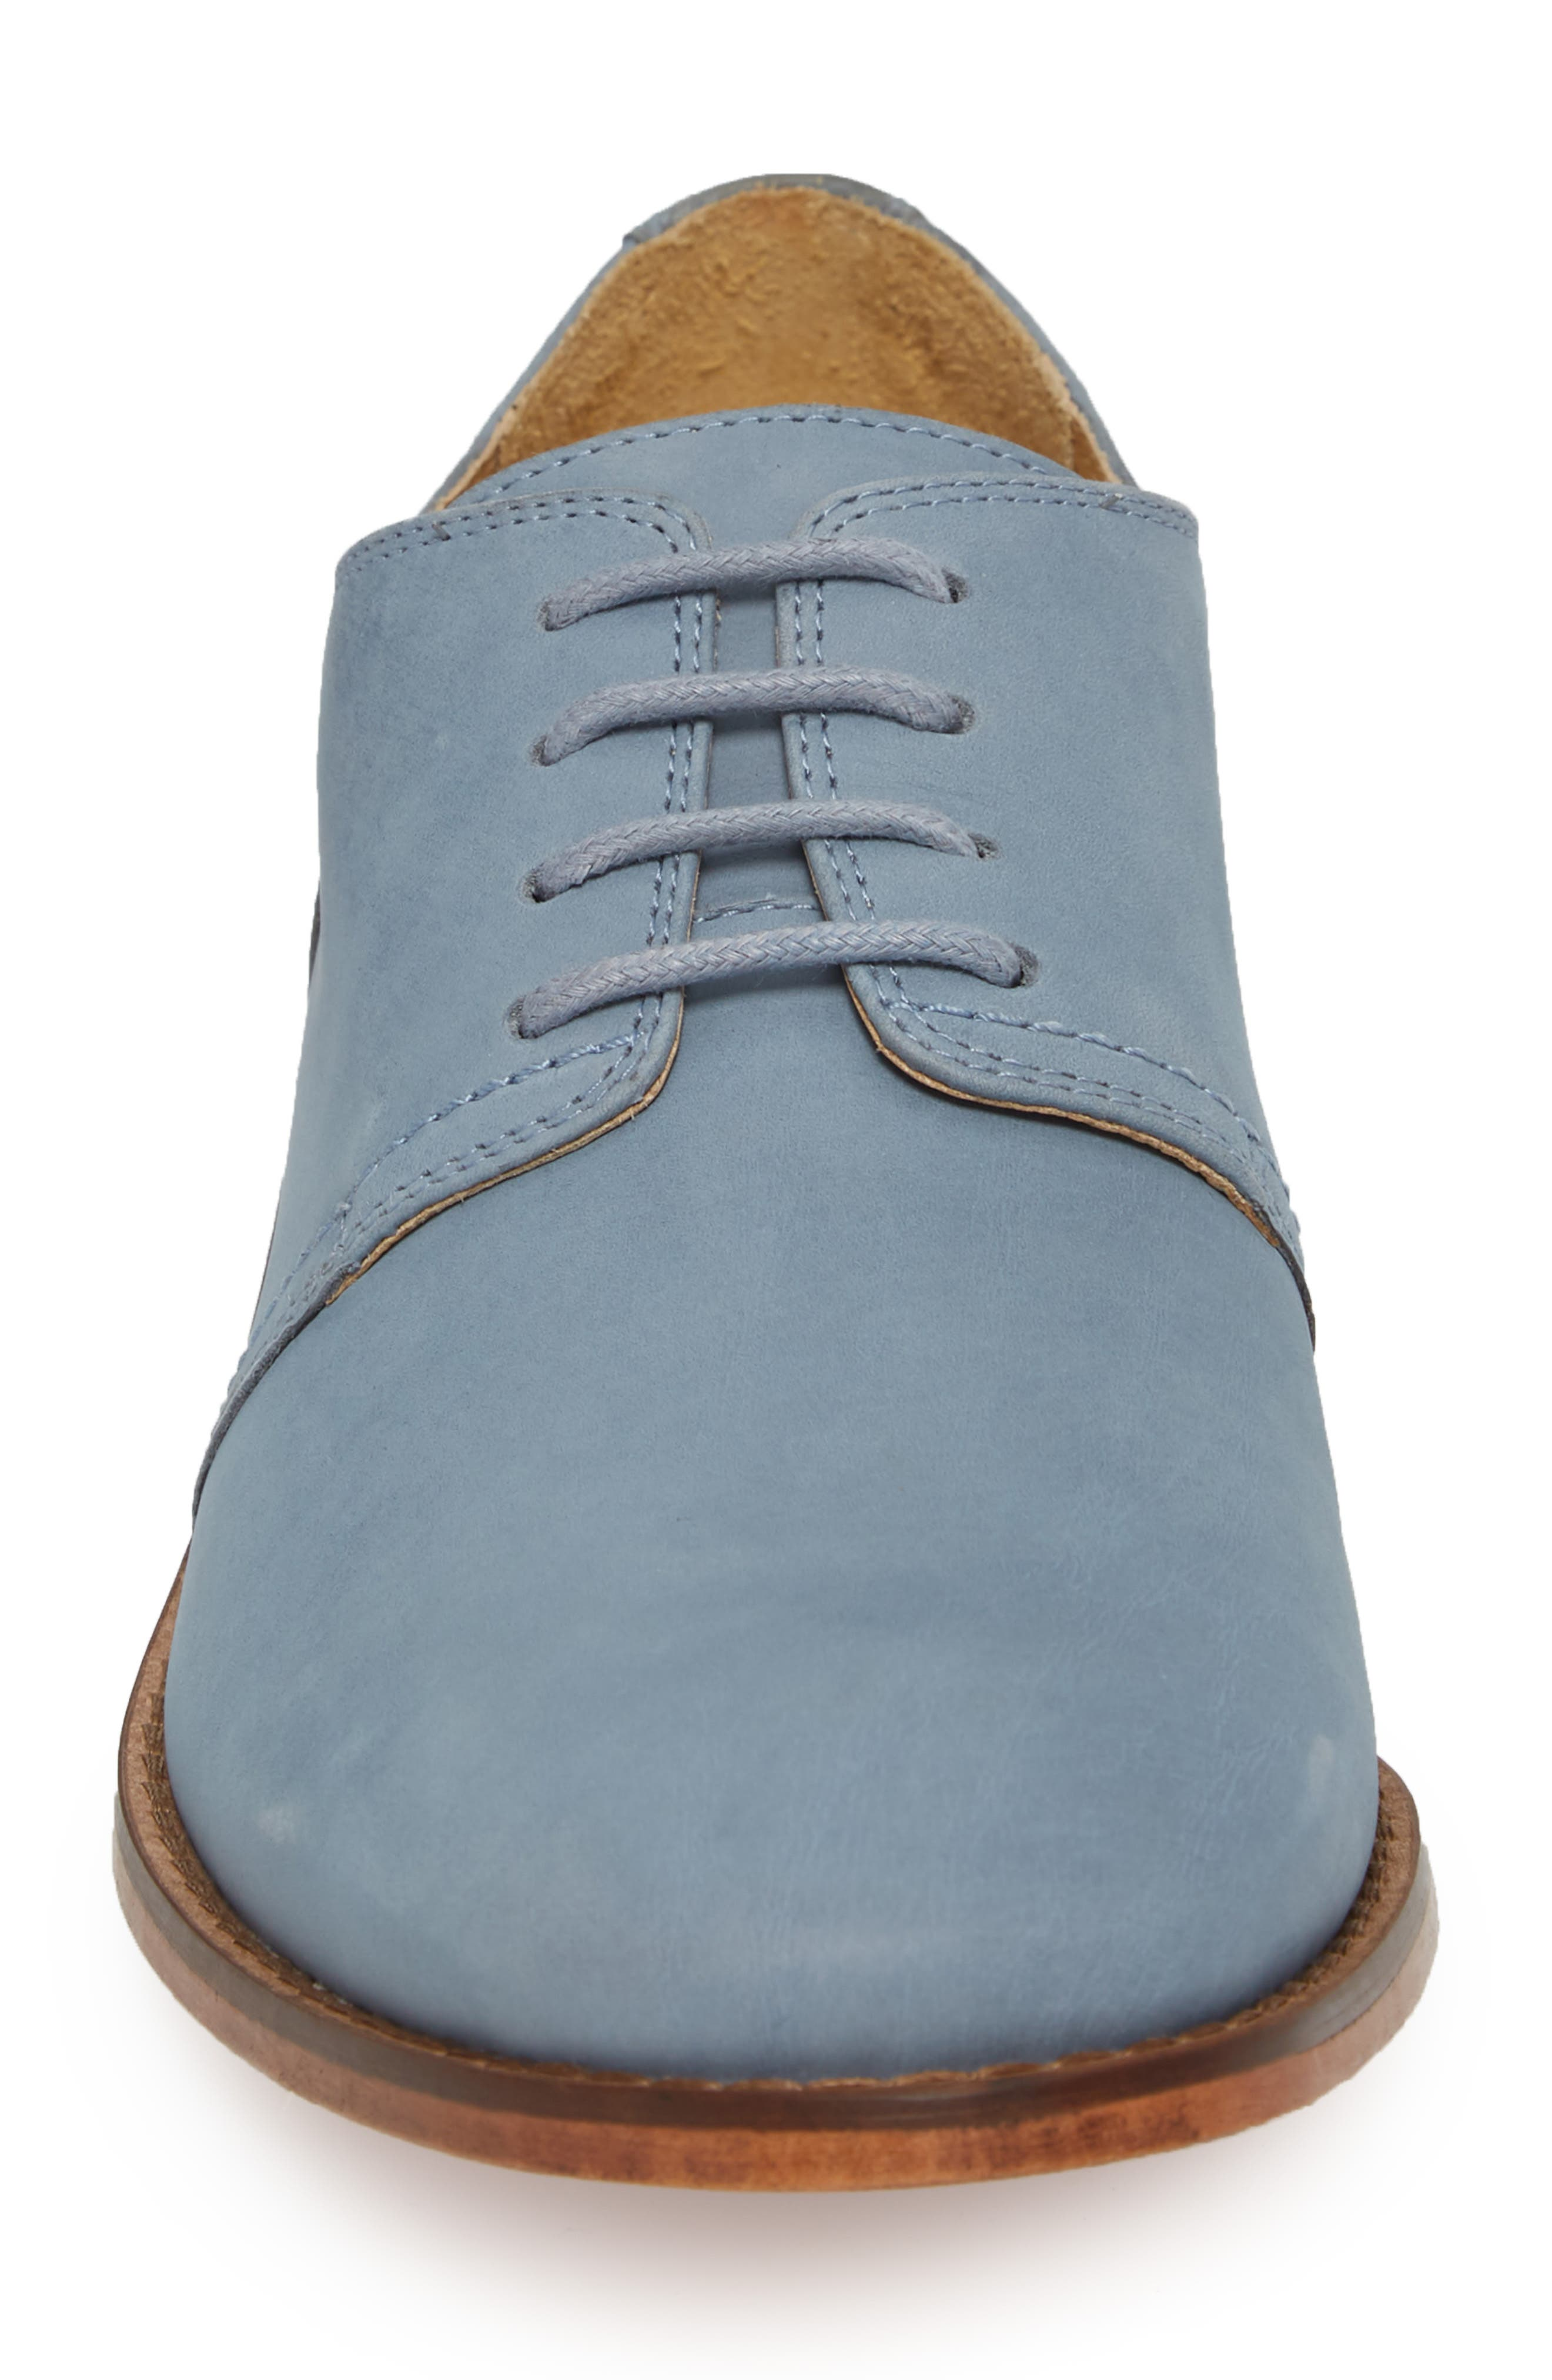 Caan Plain Toe Derby,                             Alternate thumbnail 4, color,                             Flint Stone Leather